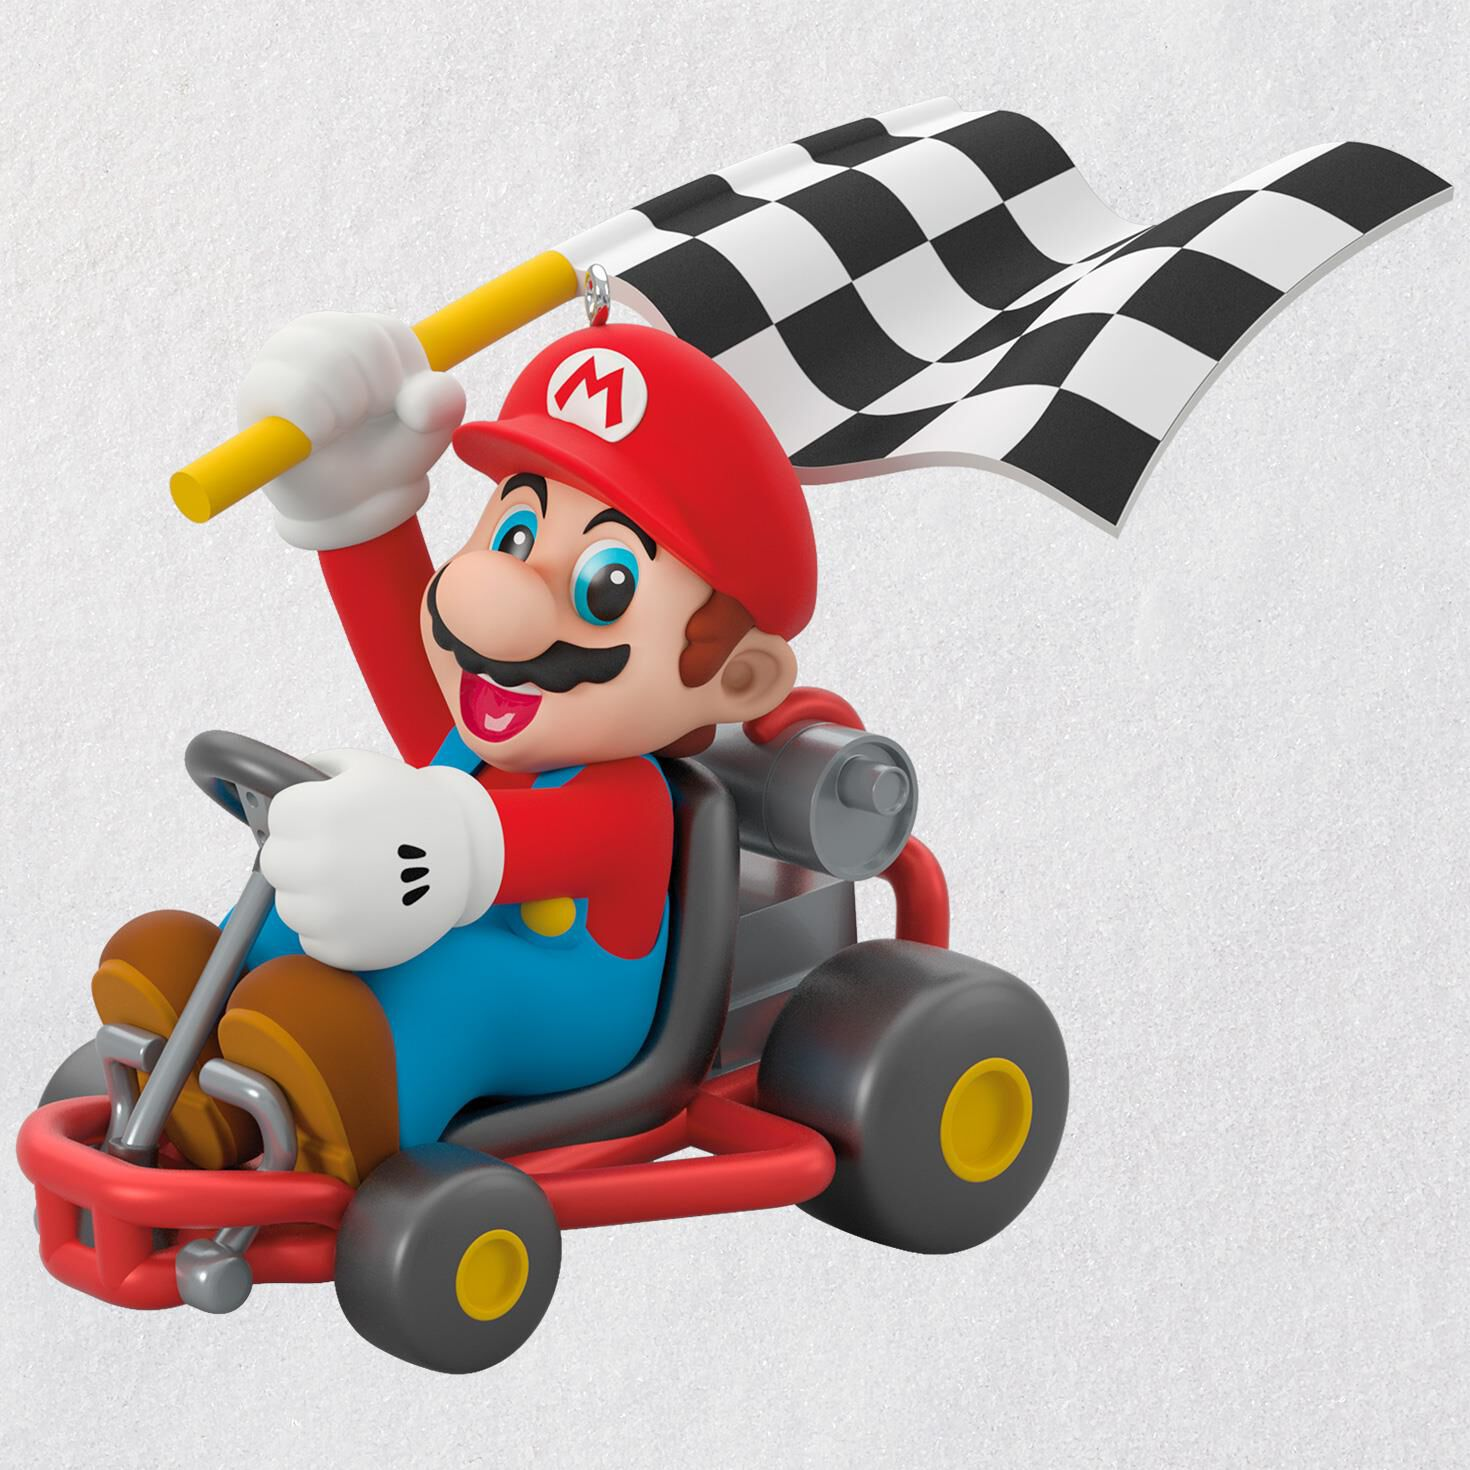 Mario Kart Ornament - Keepsake Ornaments - Hallmark